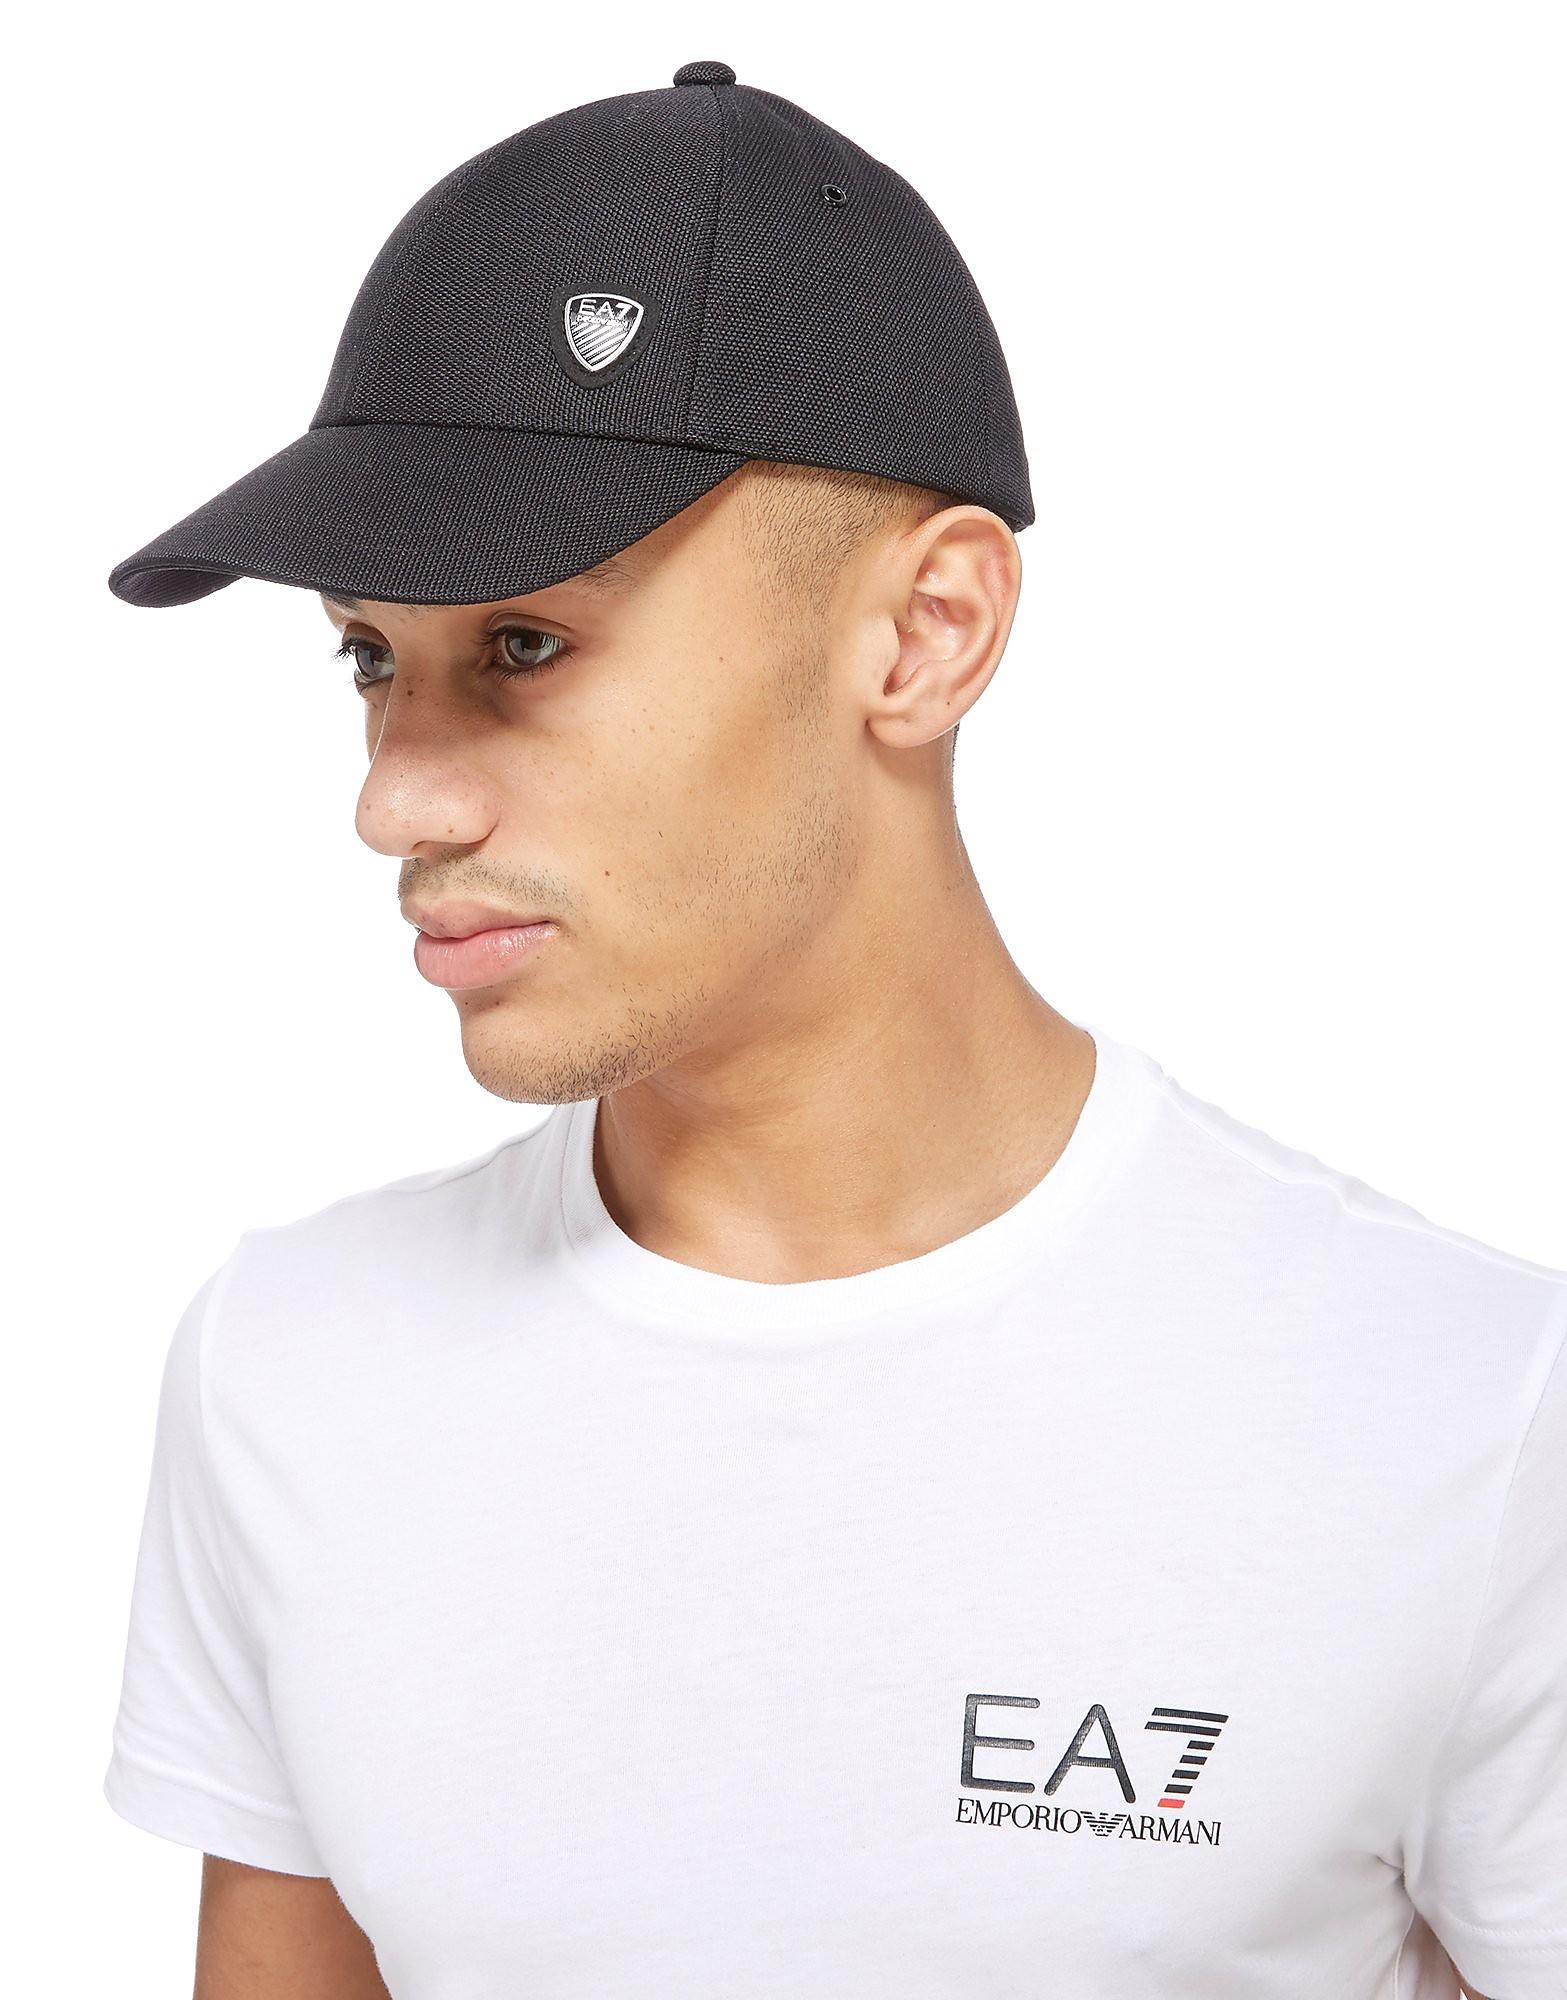 Emporio Armani EA7 Soccer Cap